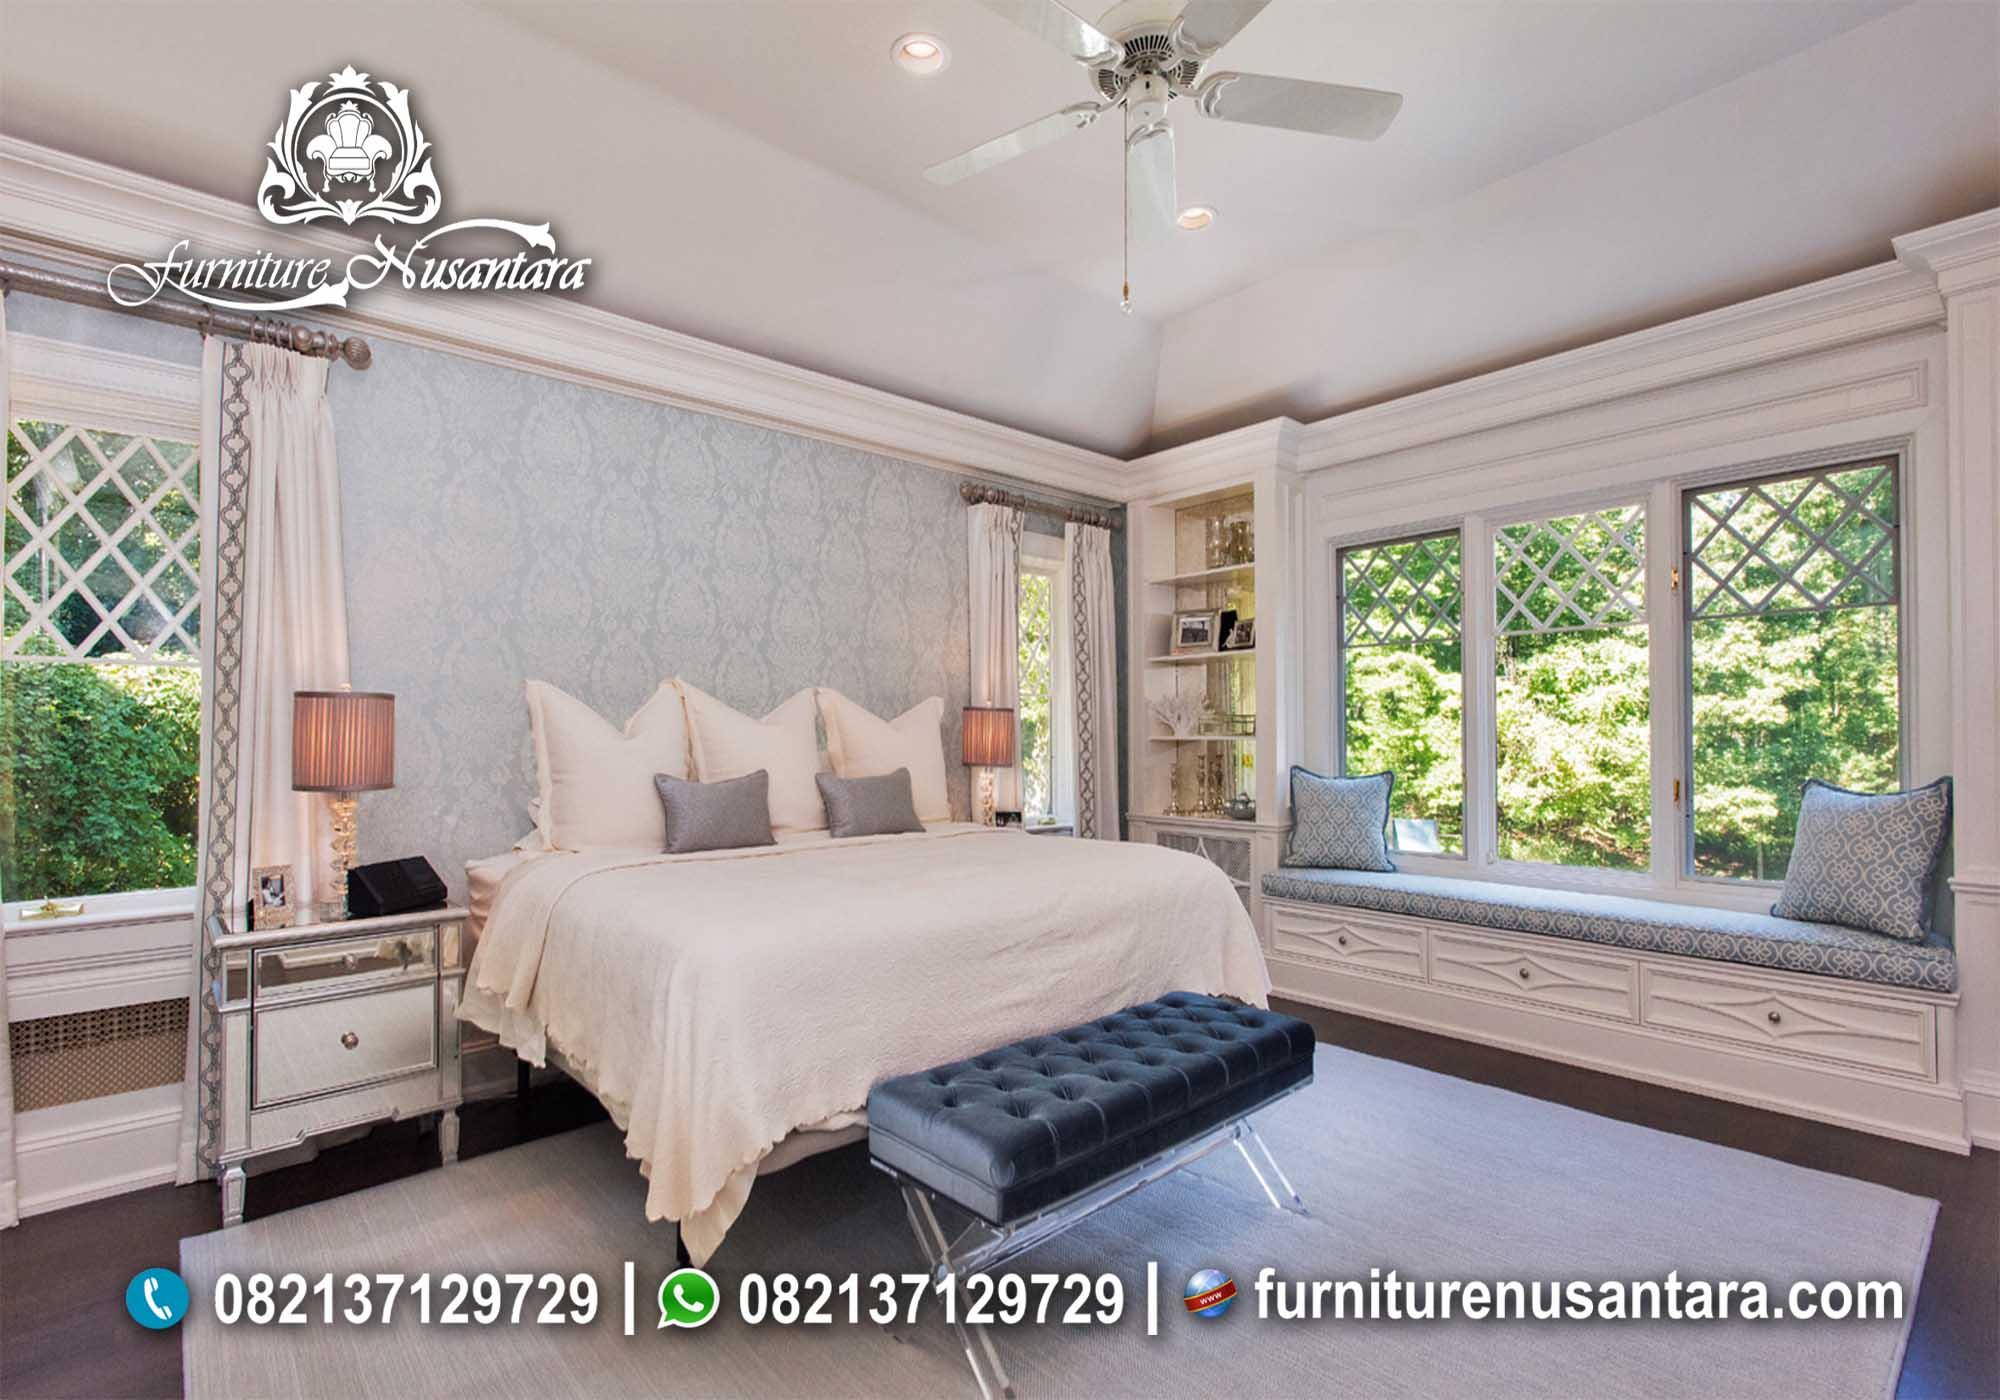 Ide Desain Kamar Minimalis KS-67, Furniture Nusantara